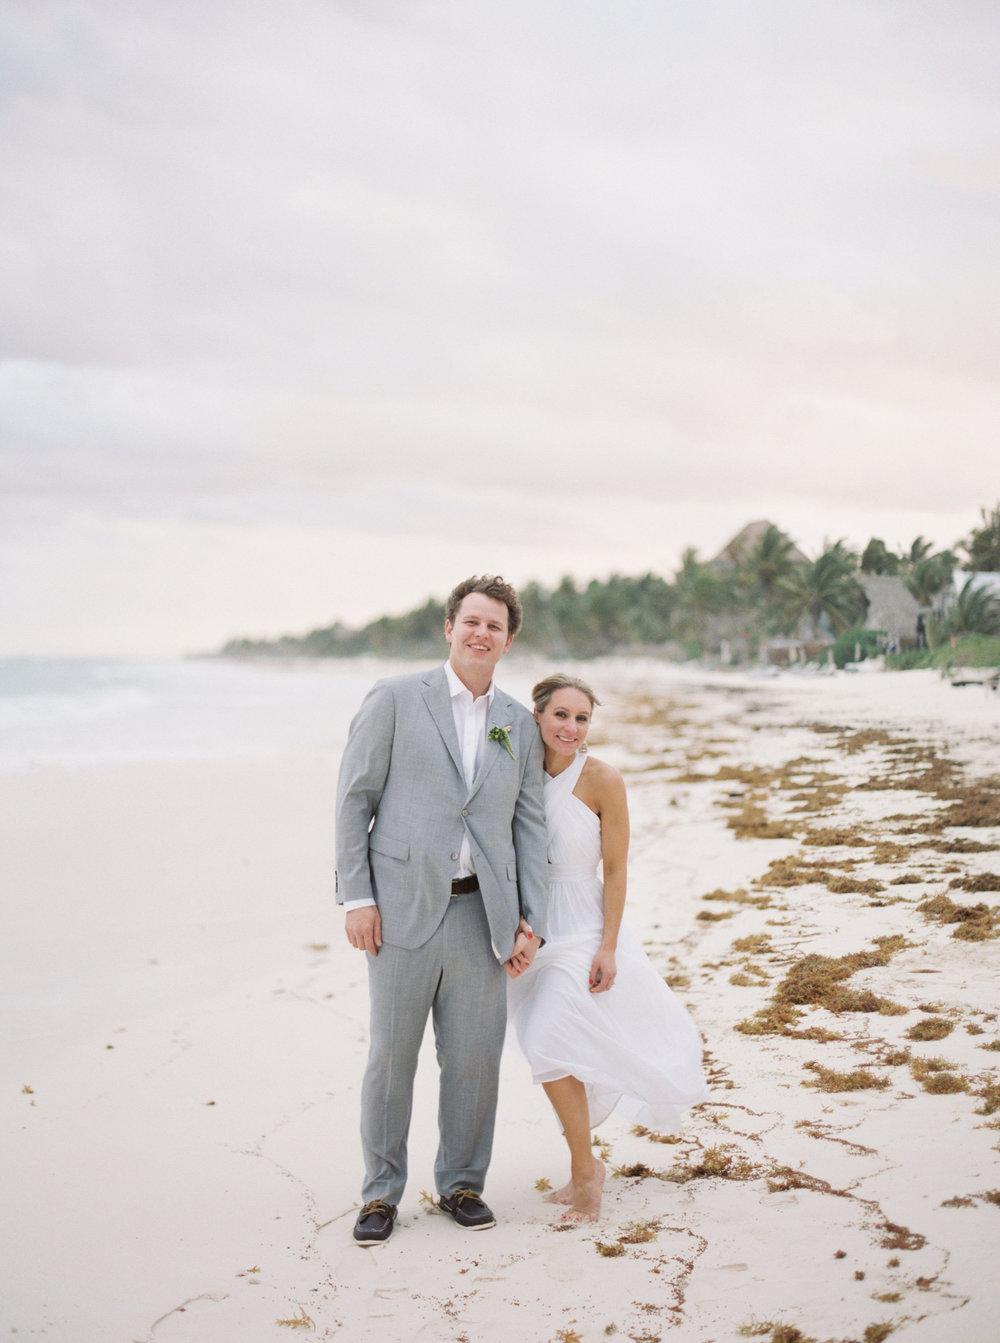 Kyle John l Fine Art Wedding Photography l Chicago, Copenhagen, California, New York, Destination l Blog l Lauren & Greg_44